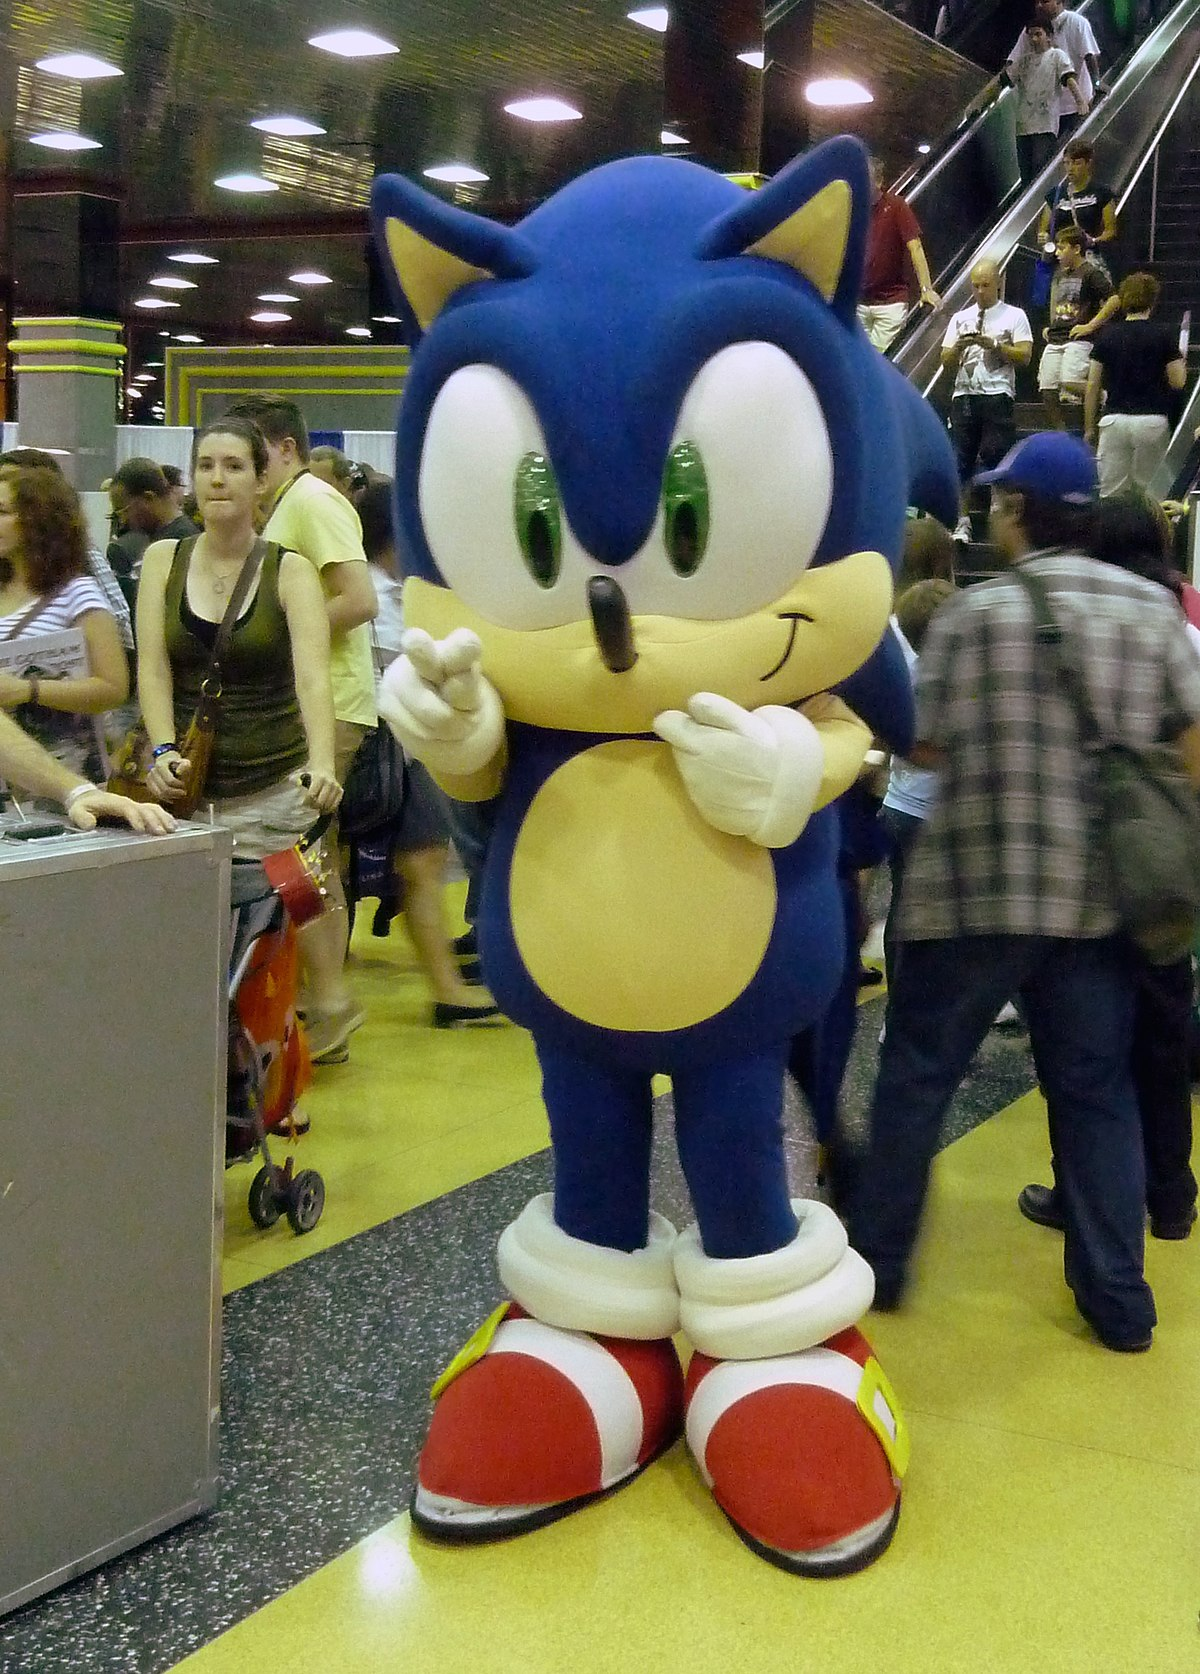 sonic hedgehog personaje 1991 imagenes wikipedia ww sega chicago wiki cosplayer world commons personajes team